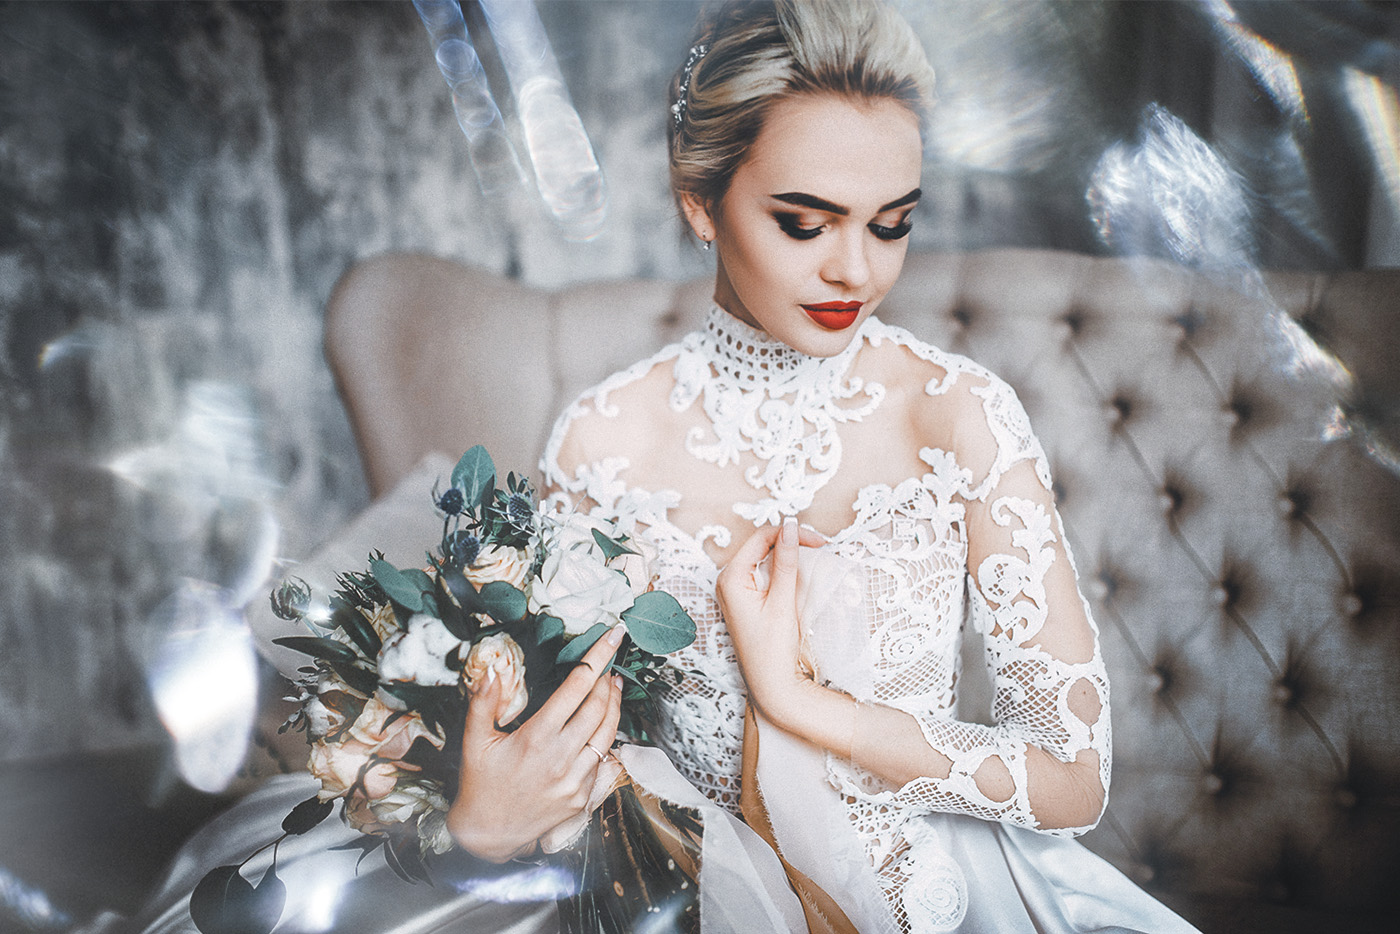 1200+ Wedding Bundle PS   LR items - 32 -